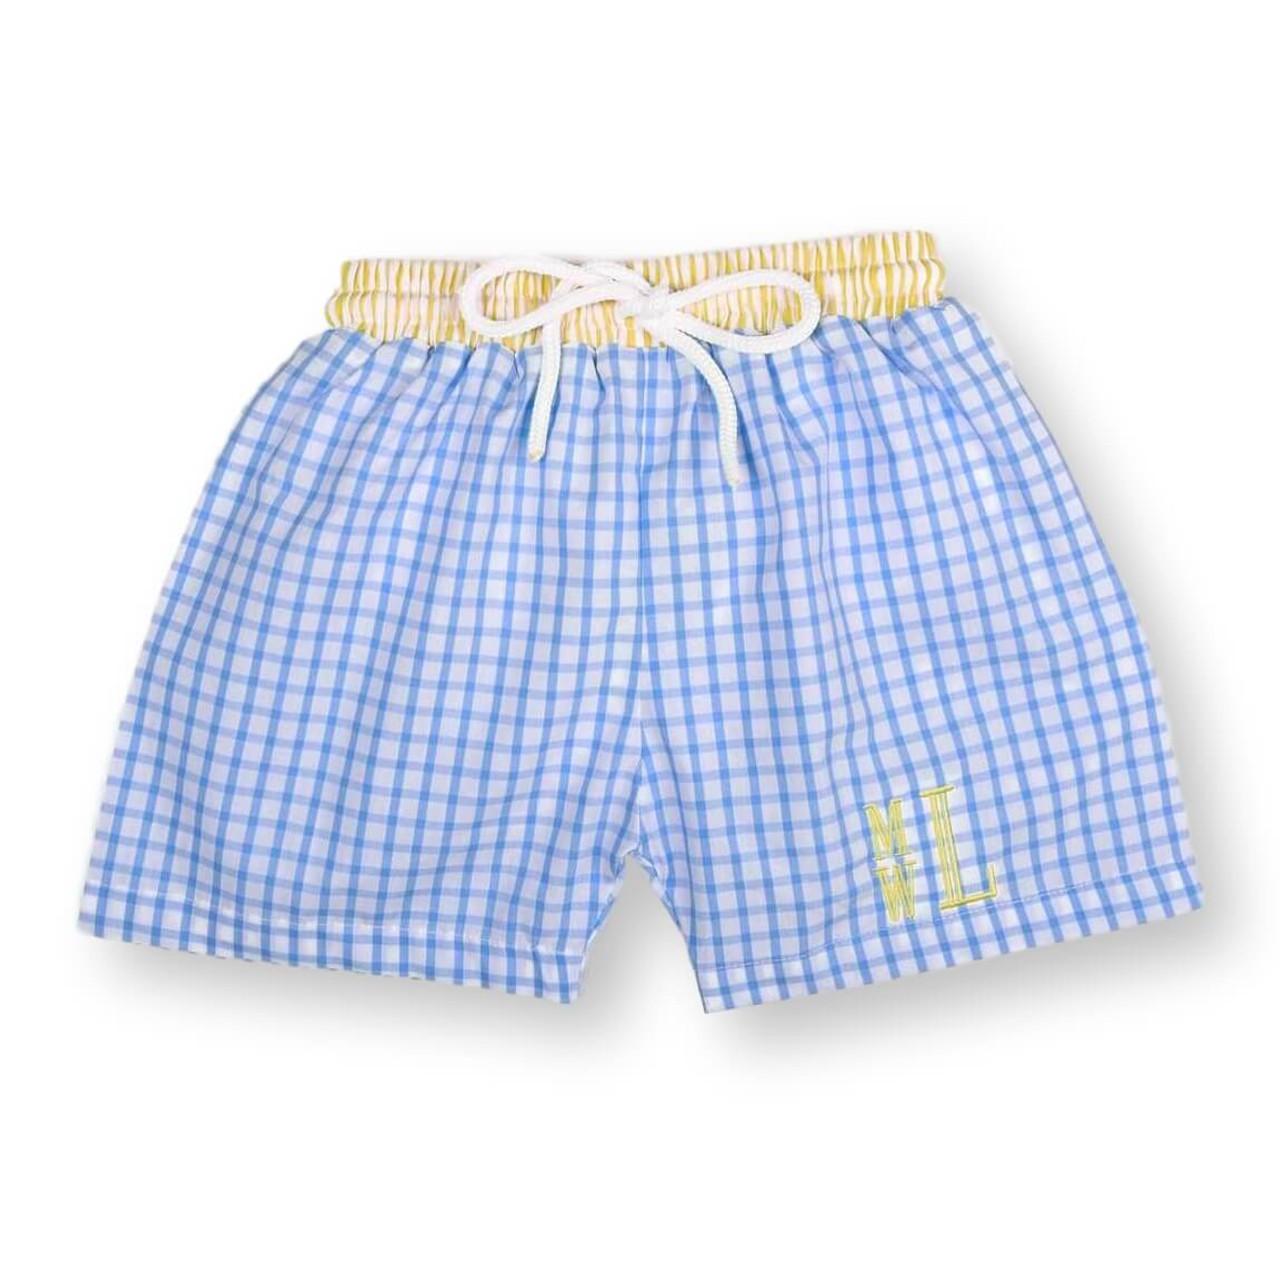 bc65ea618b Blue and Yellow Windowpane Swim Trunks - Cecil and Lou